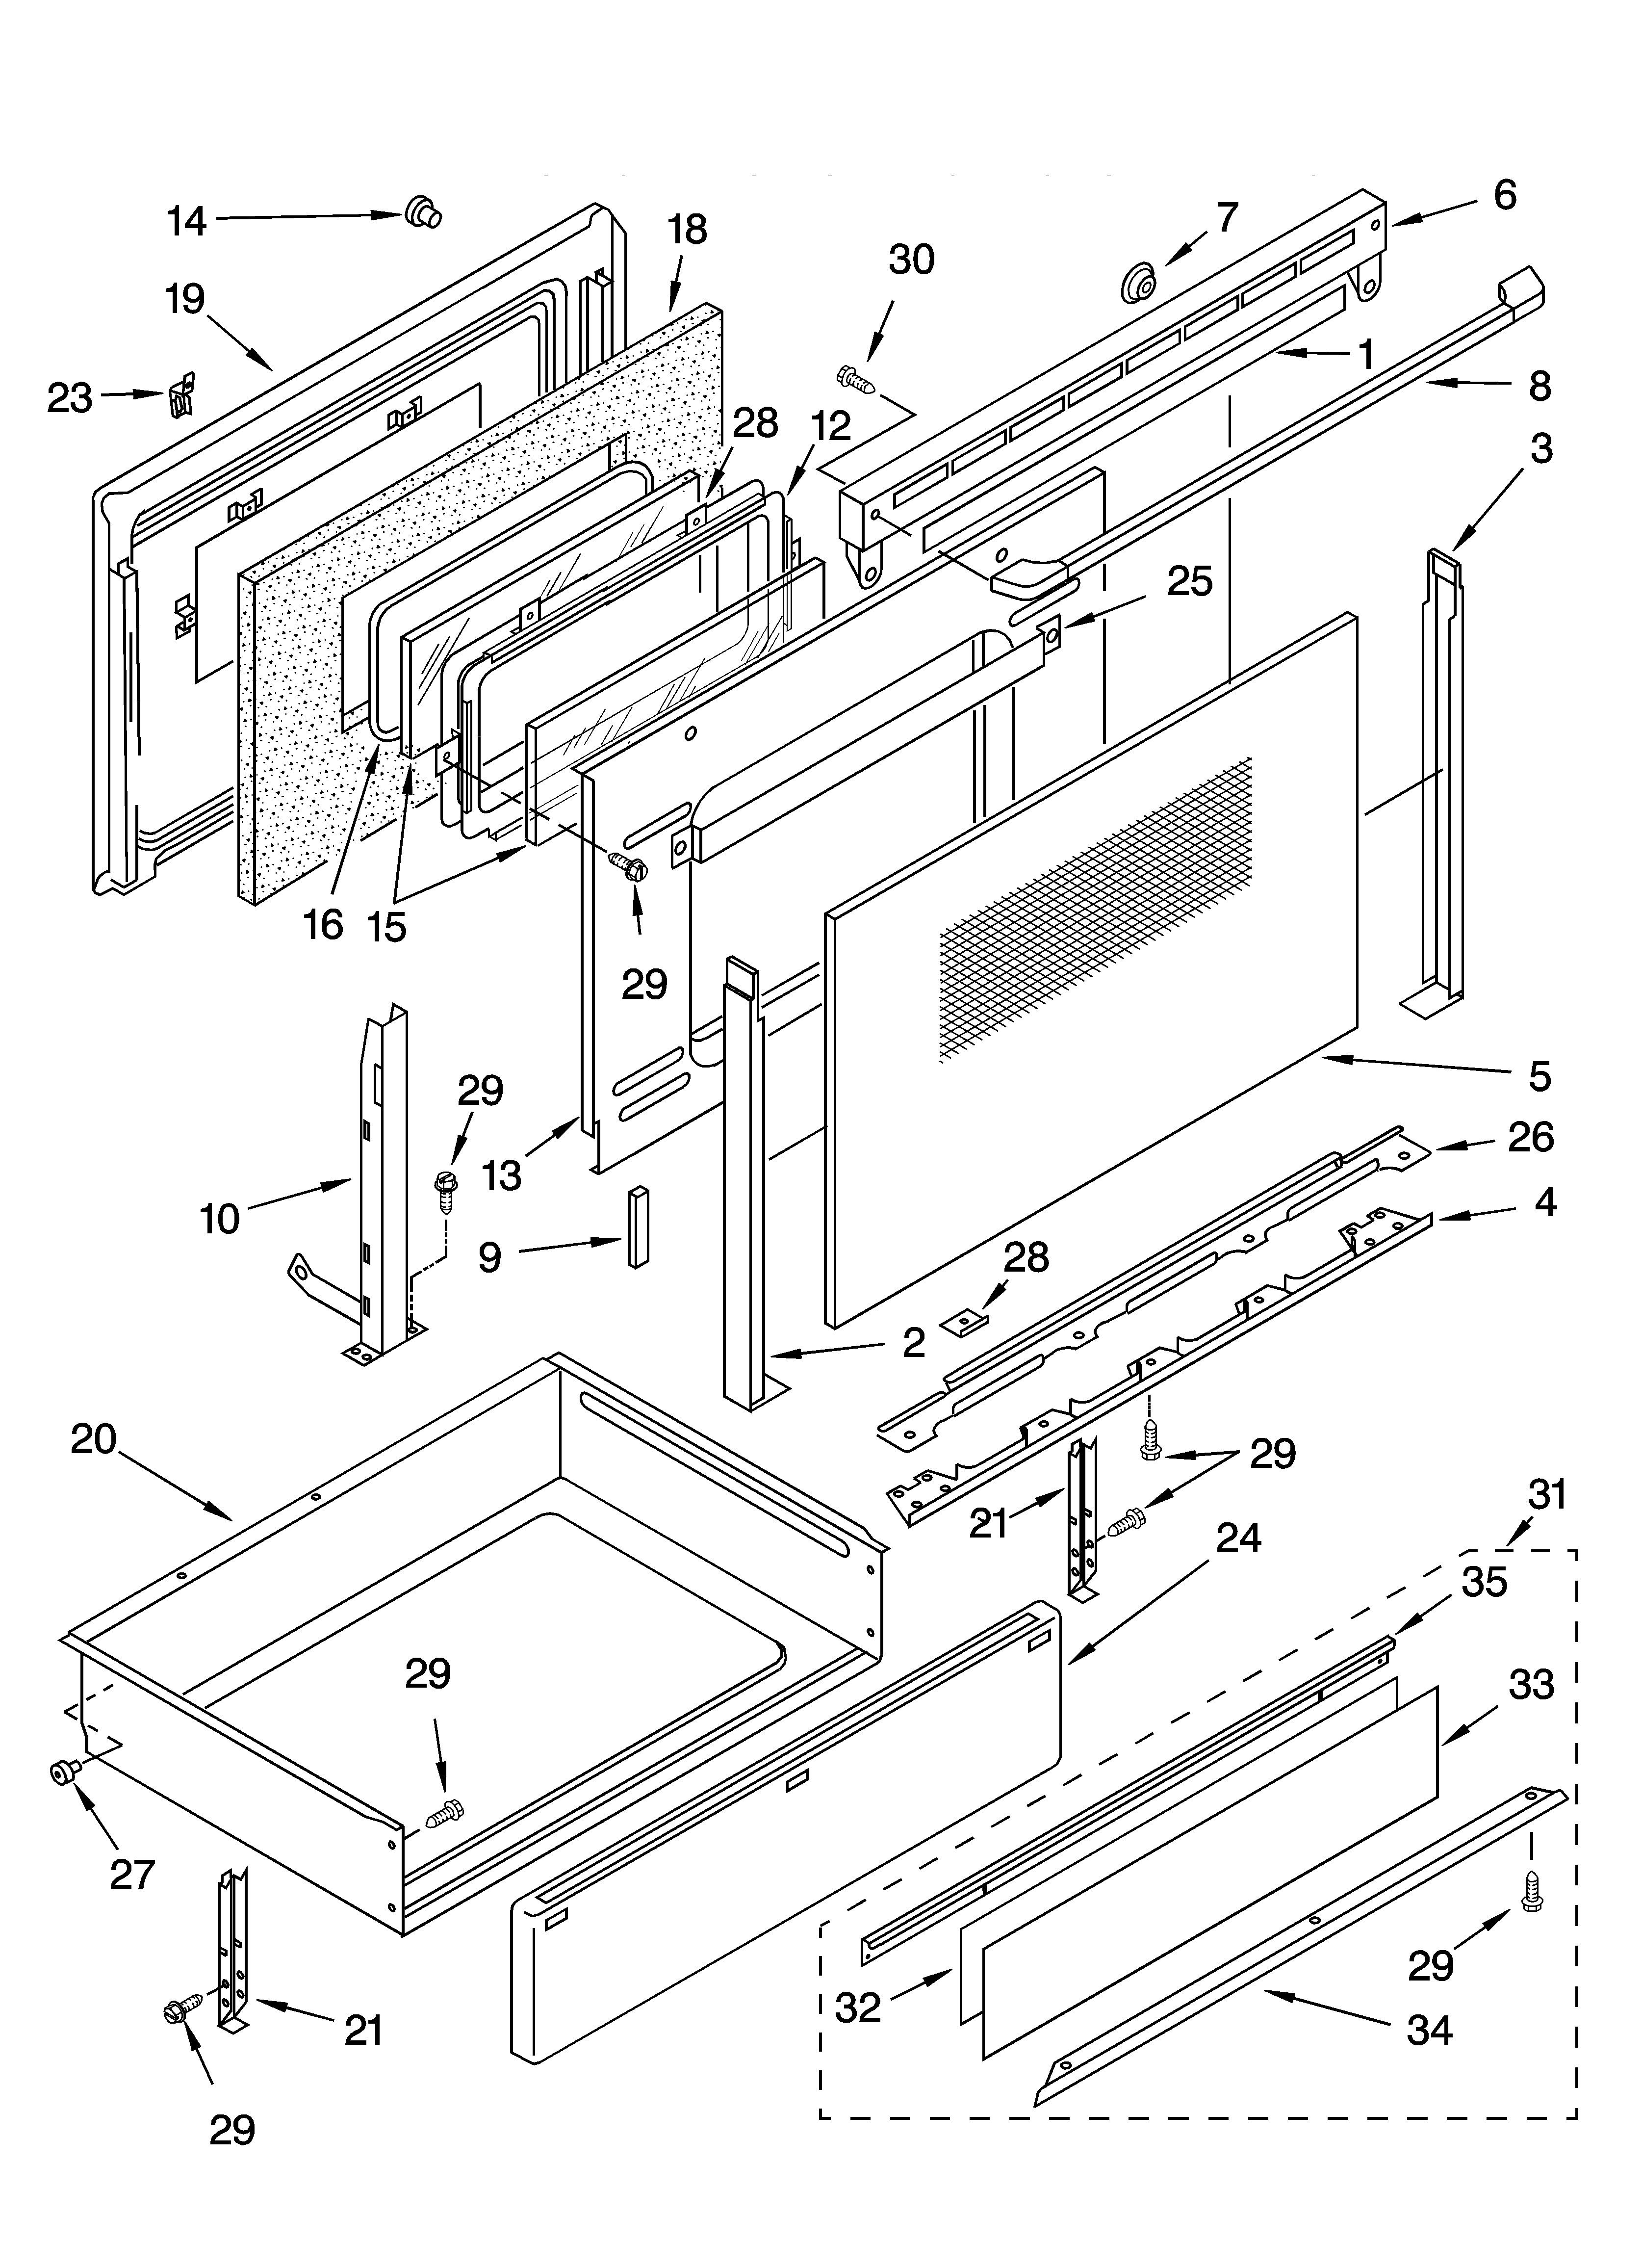 Ykerc507hw4 Free Standing Electric Range Door And Drawer Parts Diagram